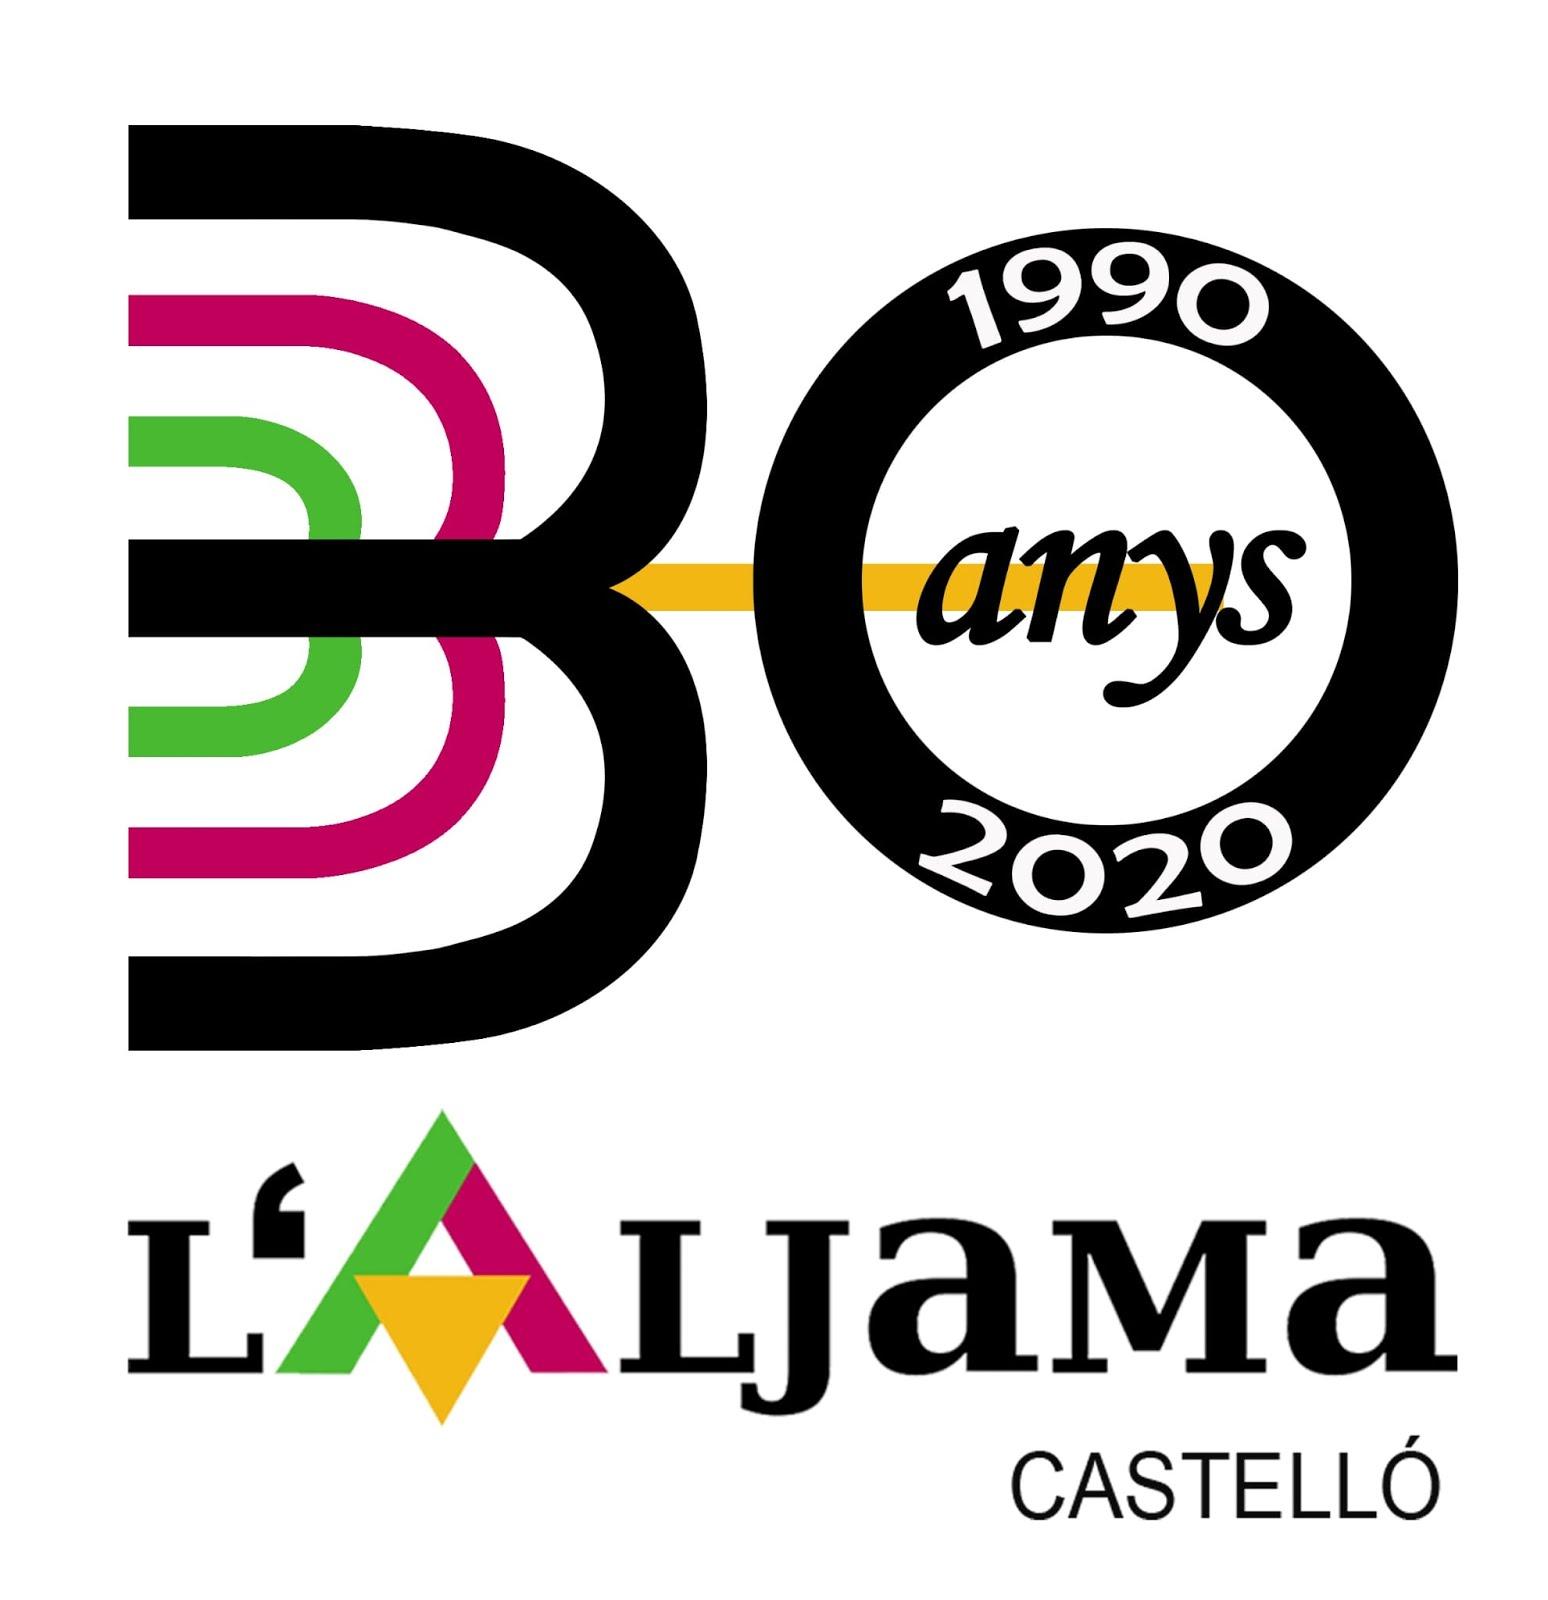 Logo del 30 aniversario de l'Aljama